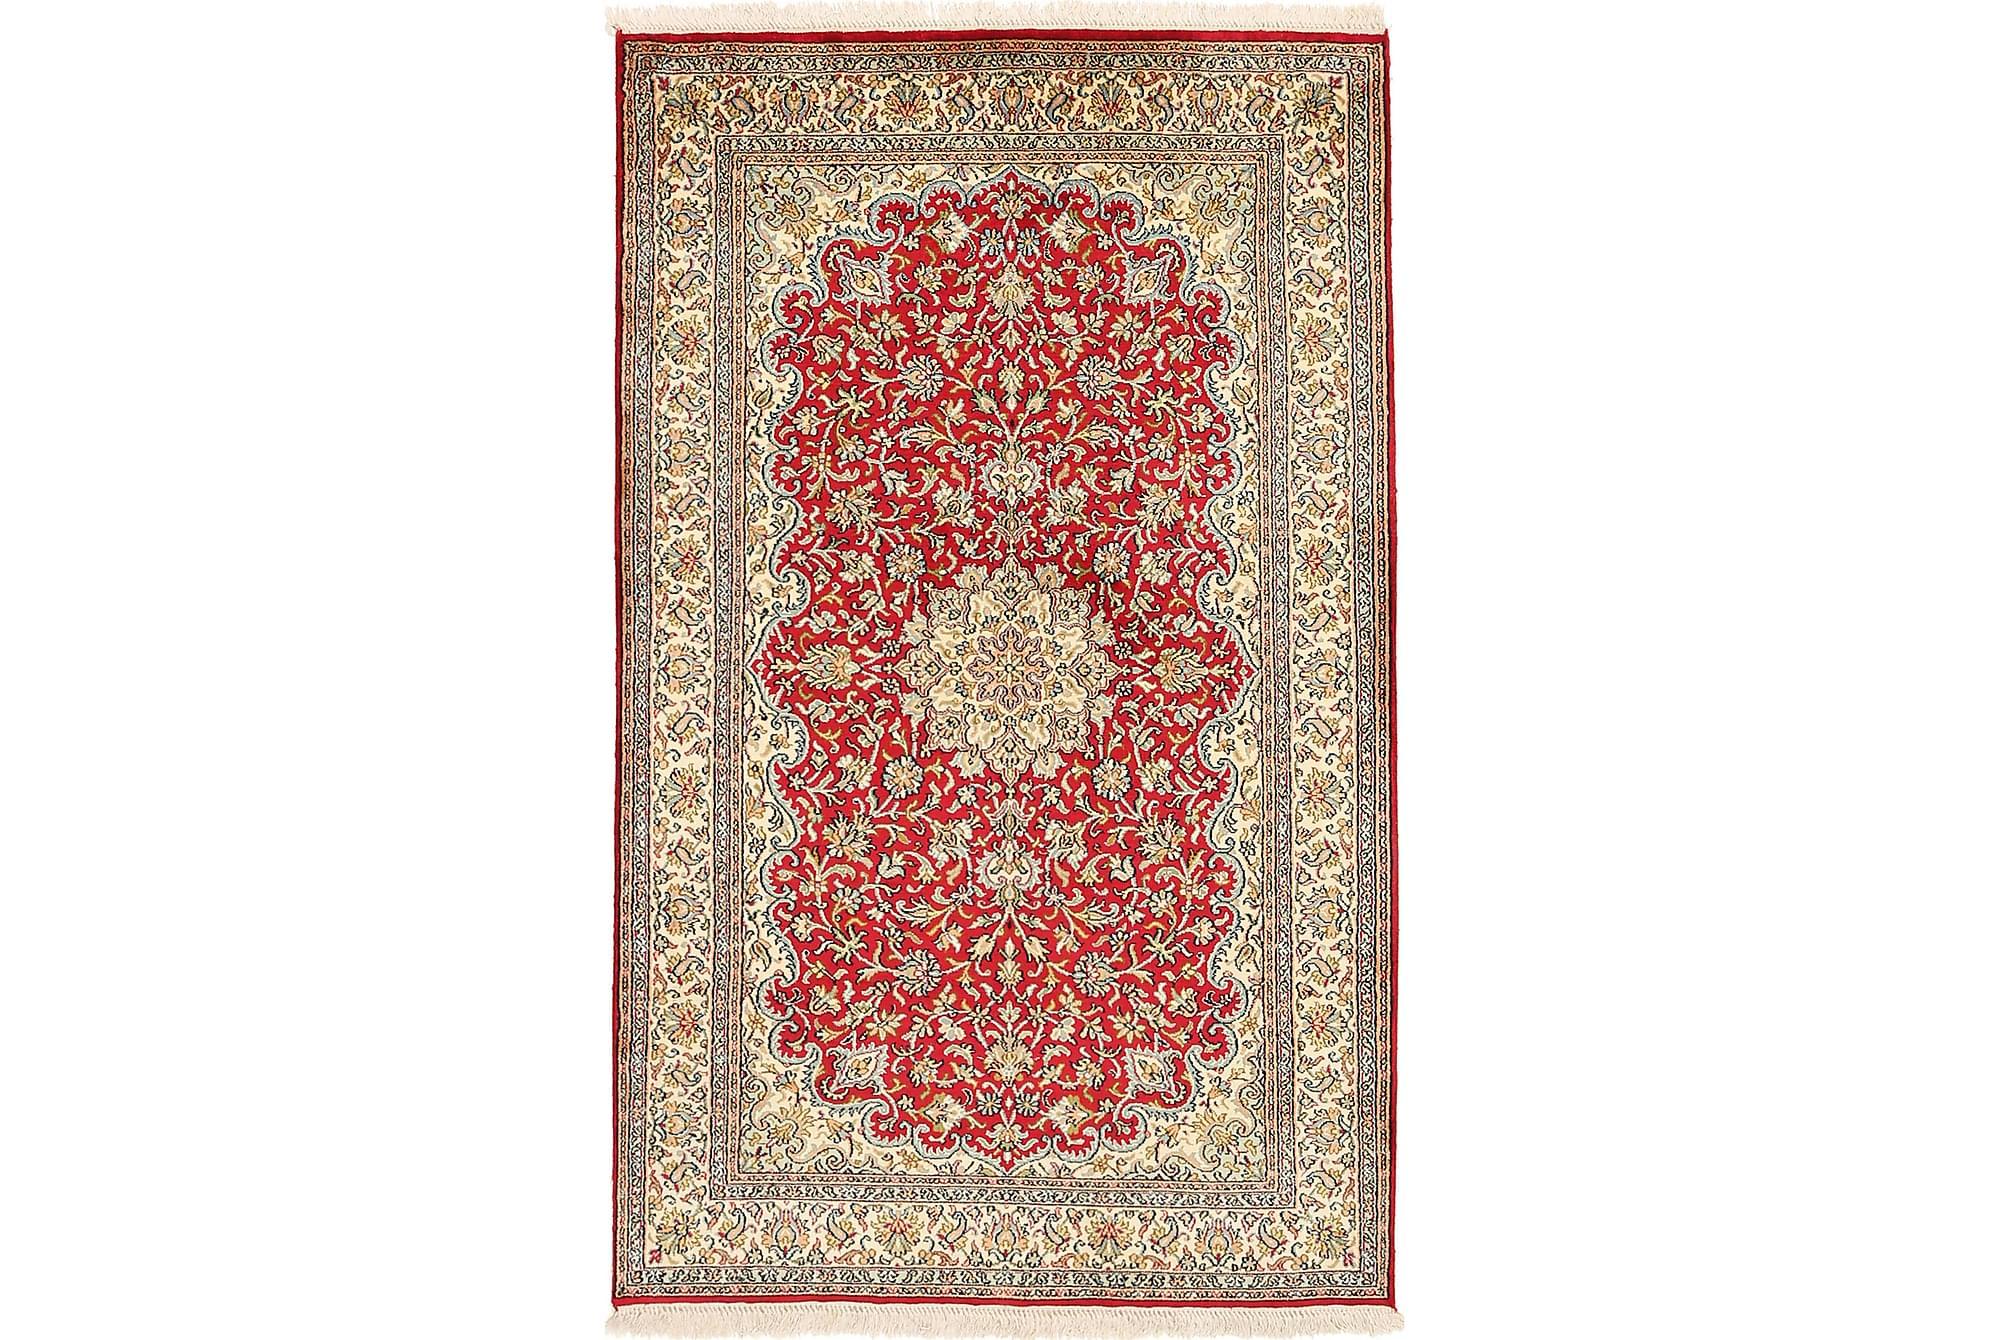 ORIENTALISK Silkesmatta Kashmir 94x156, Äkta silkesmattor